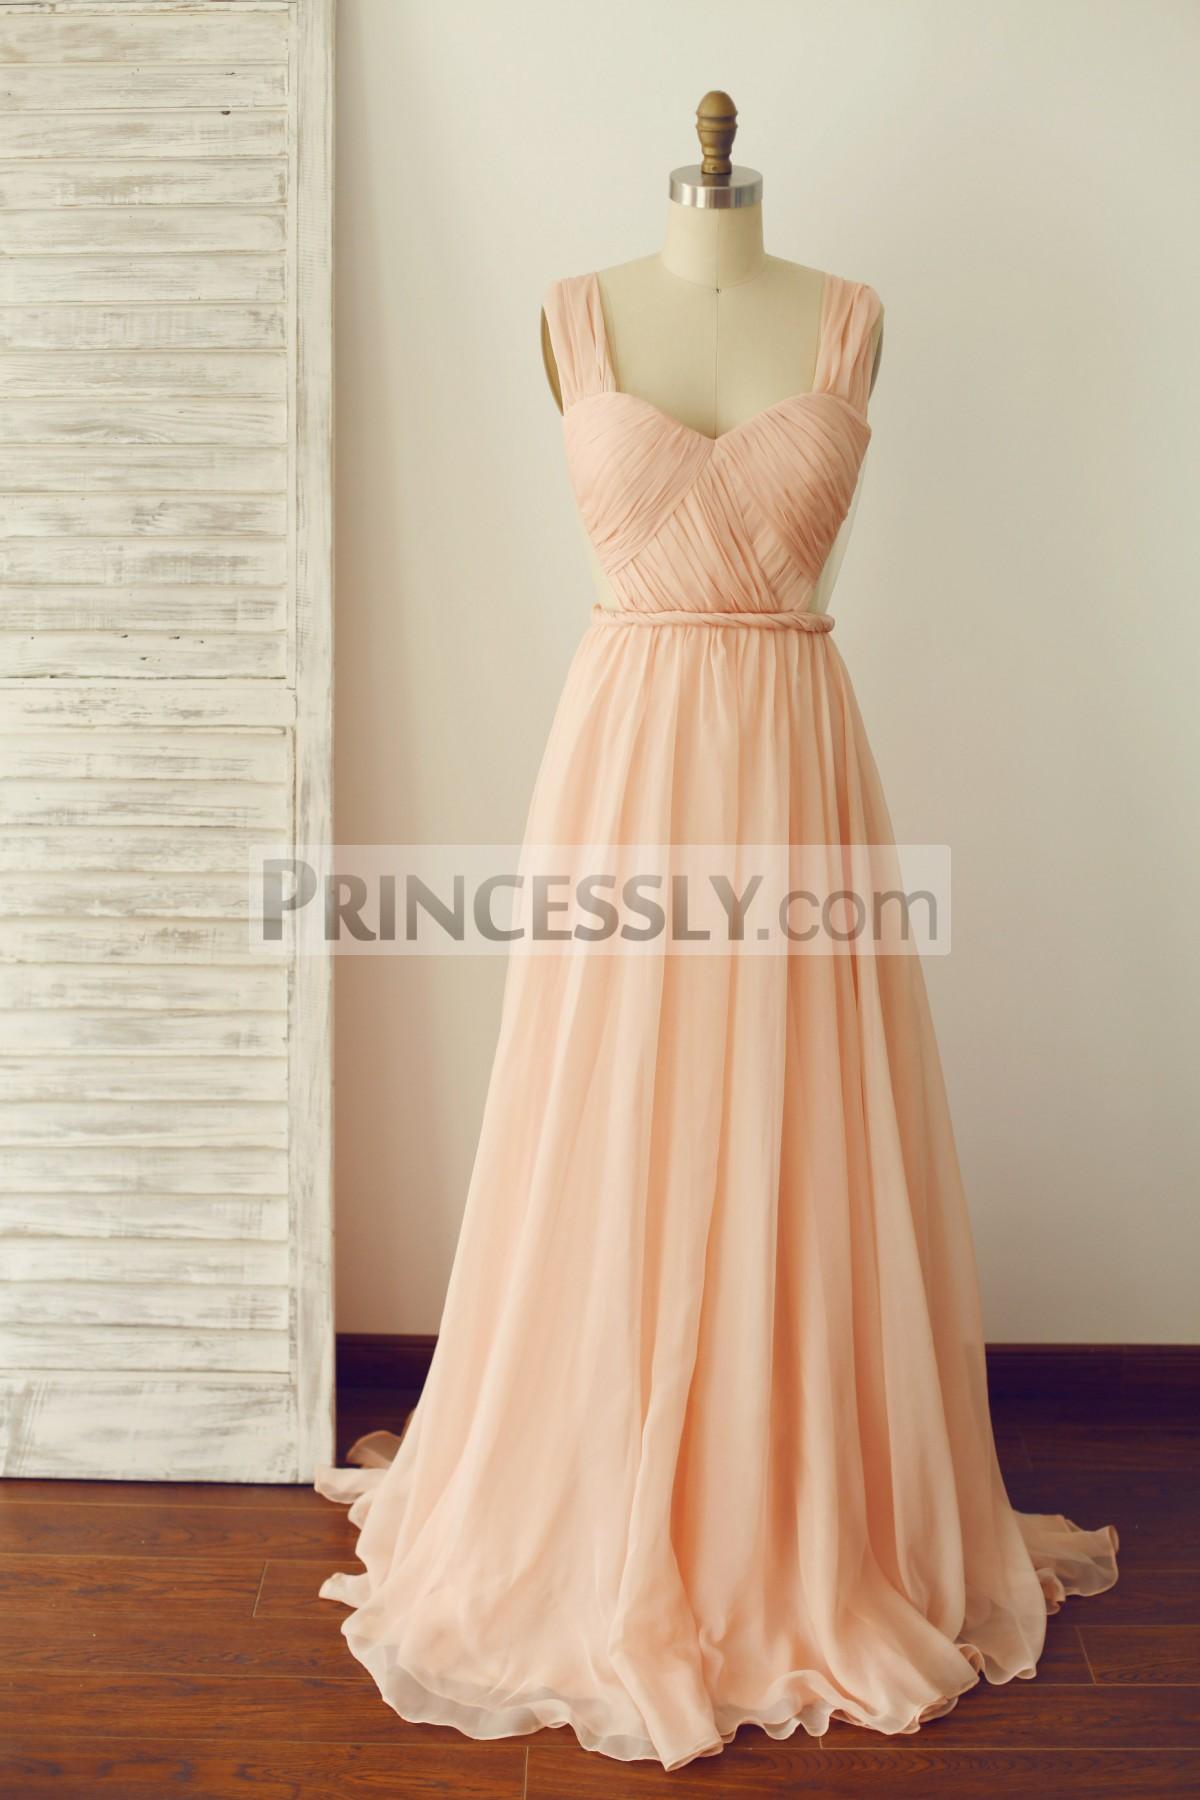 Princessly.com-K1003284-A Line Backless Peach Chiffon Prom Dress-31